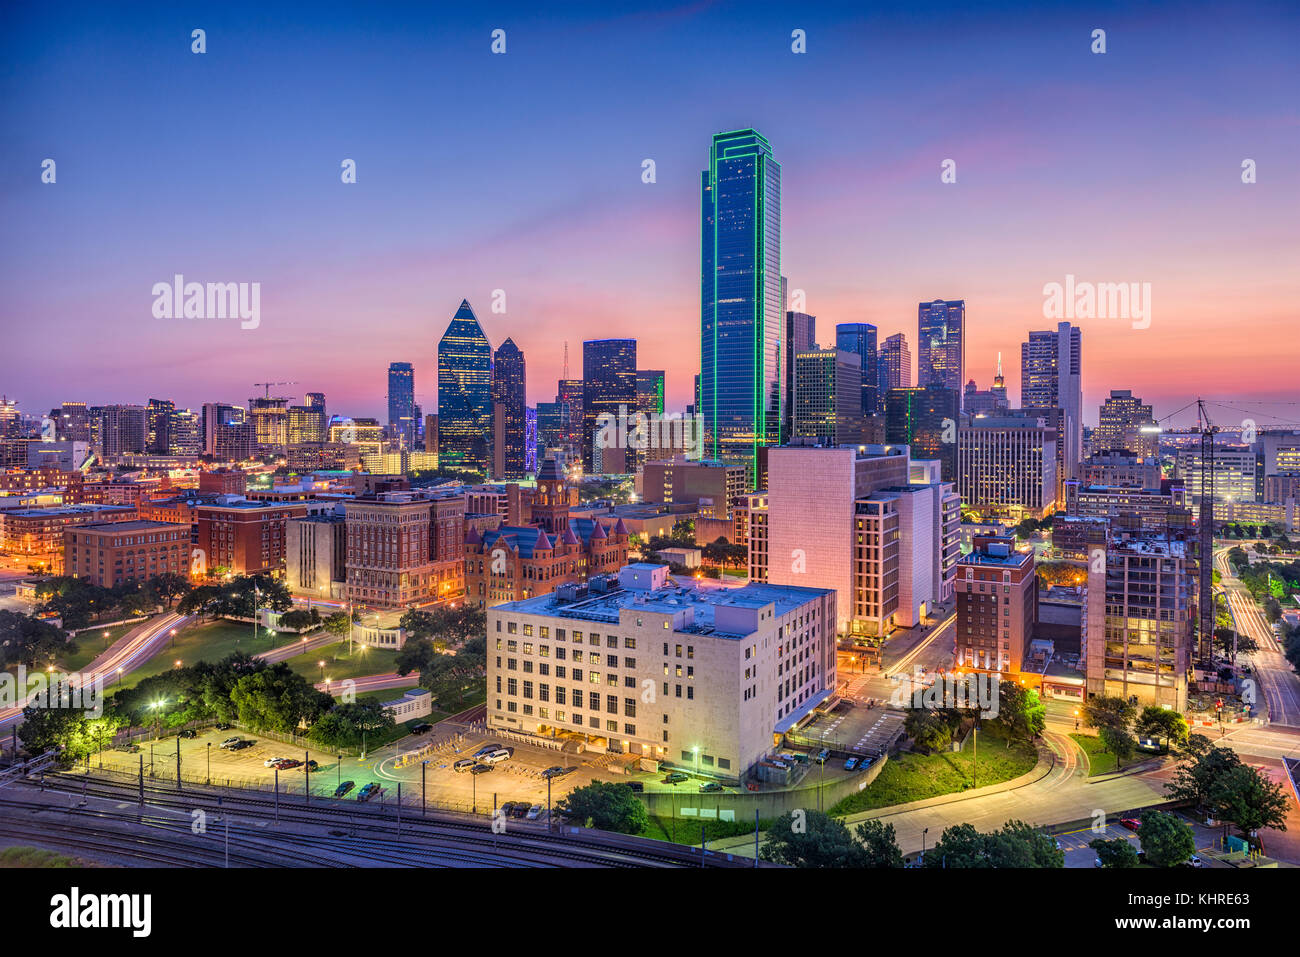 Downtown Dallas Tx Stock Photos Amp Downtown Dallas Tx Stock